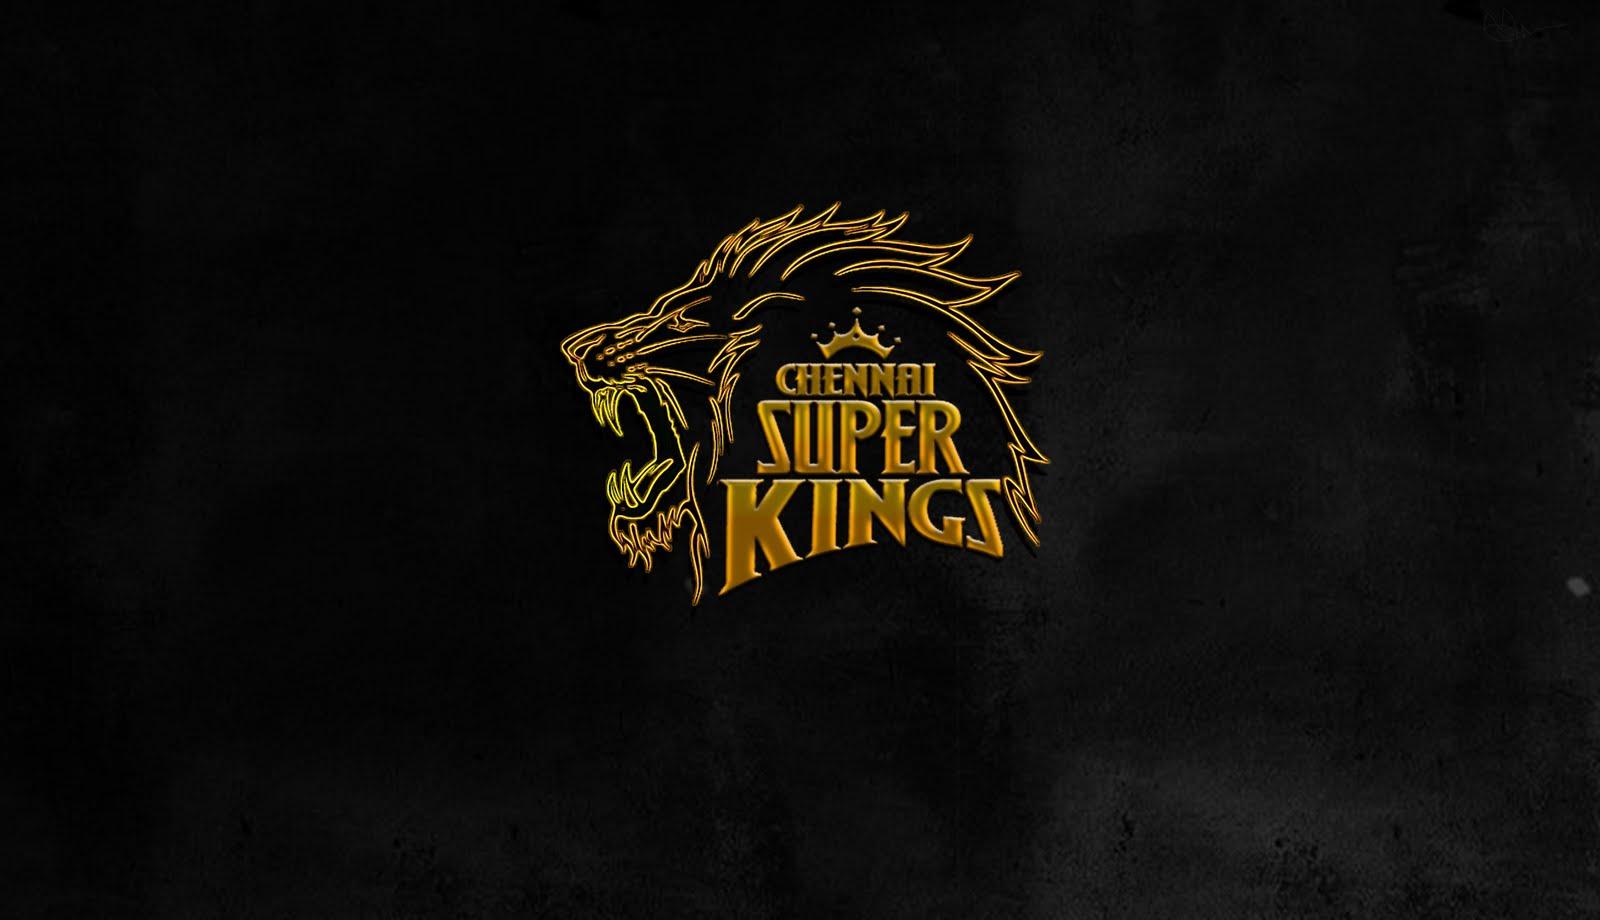 IPL WALLPAPERS: Chennai Super Kings